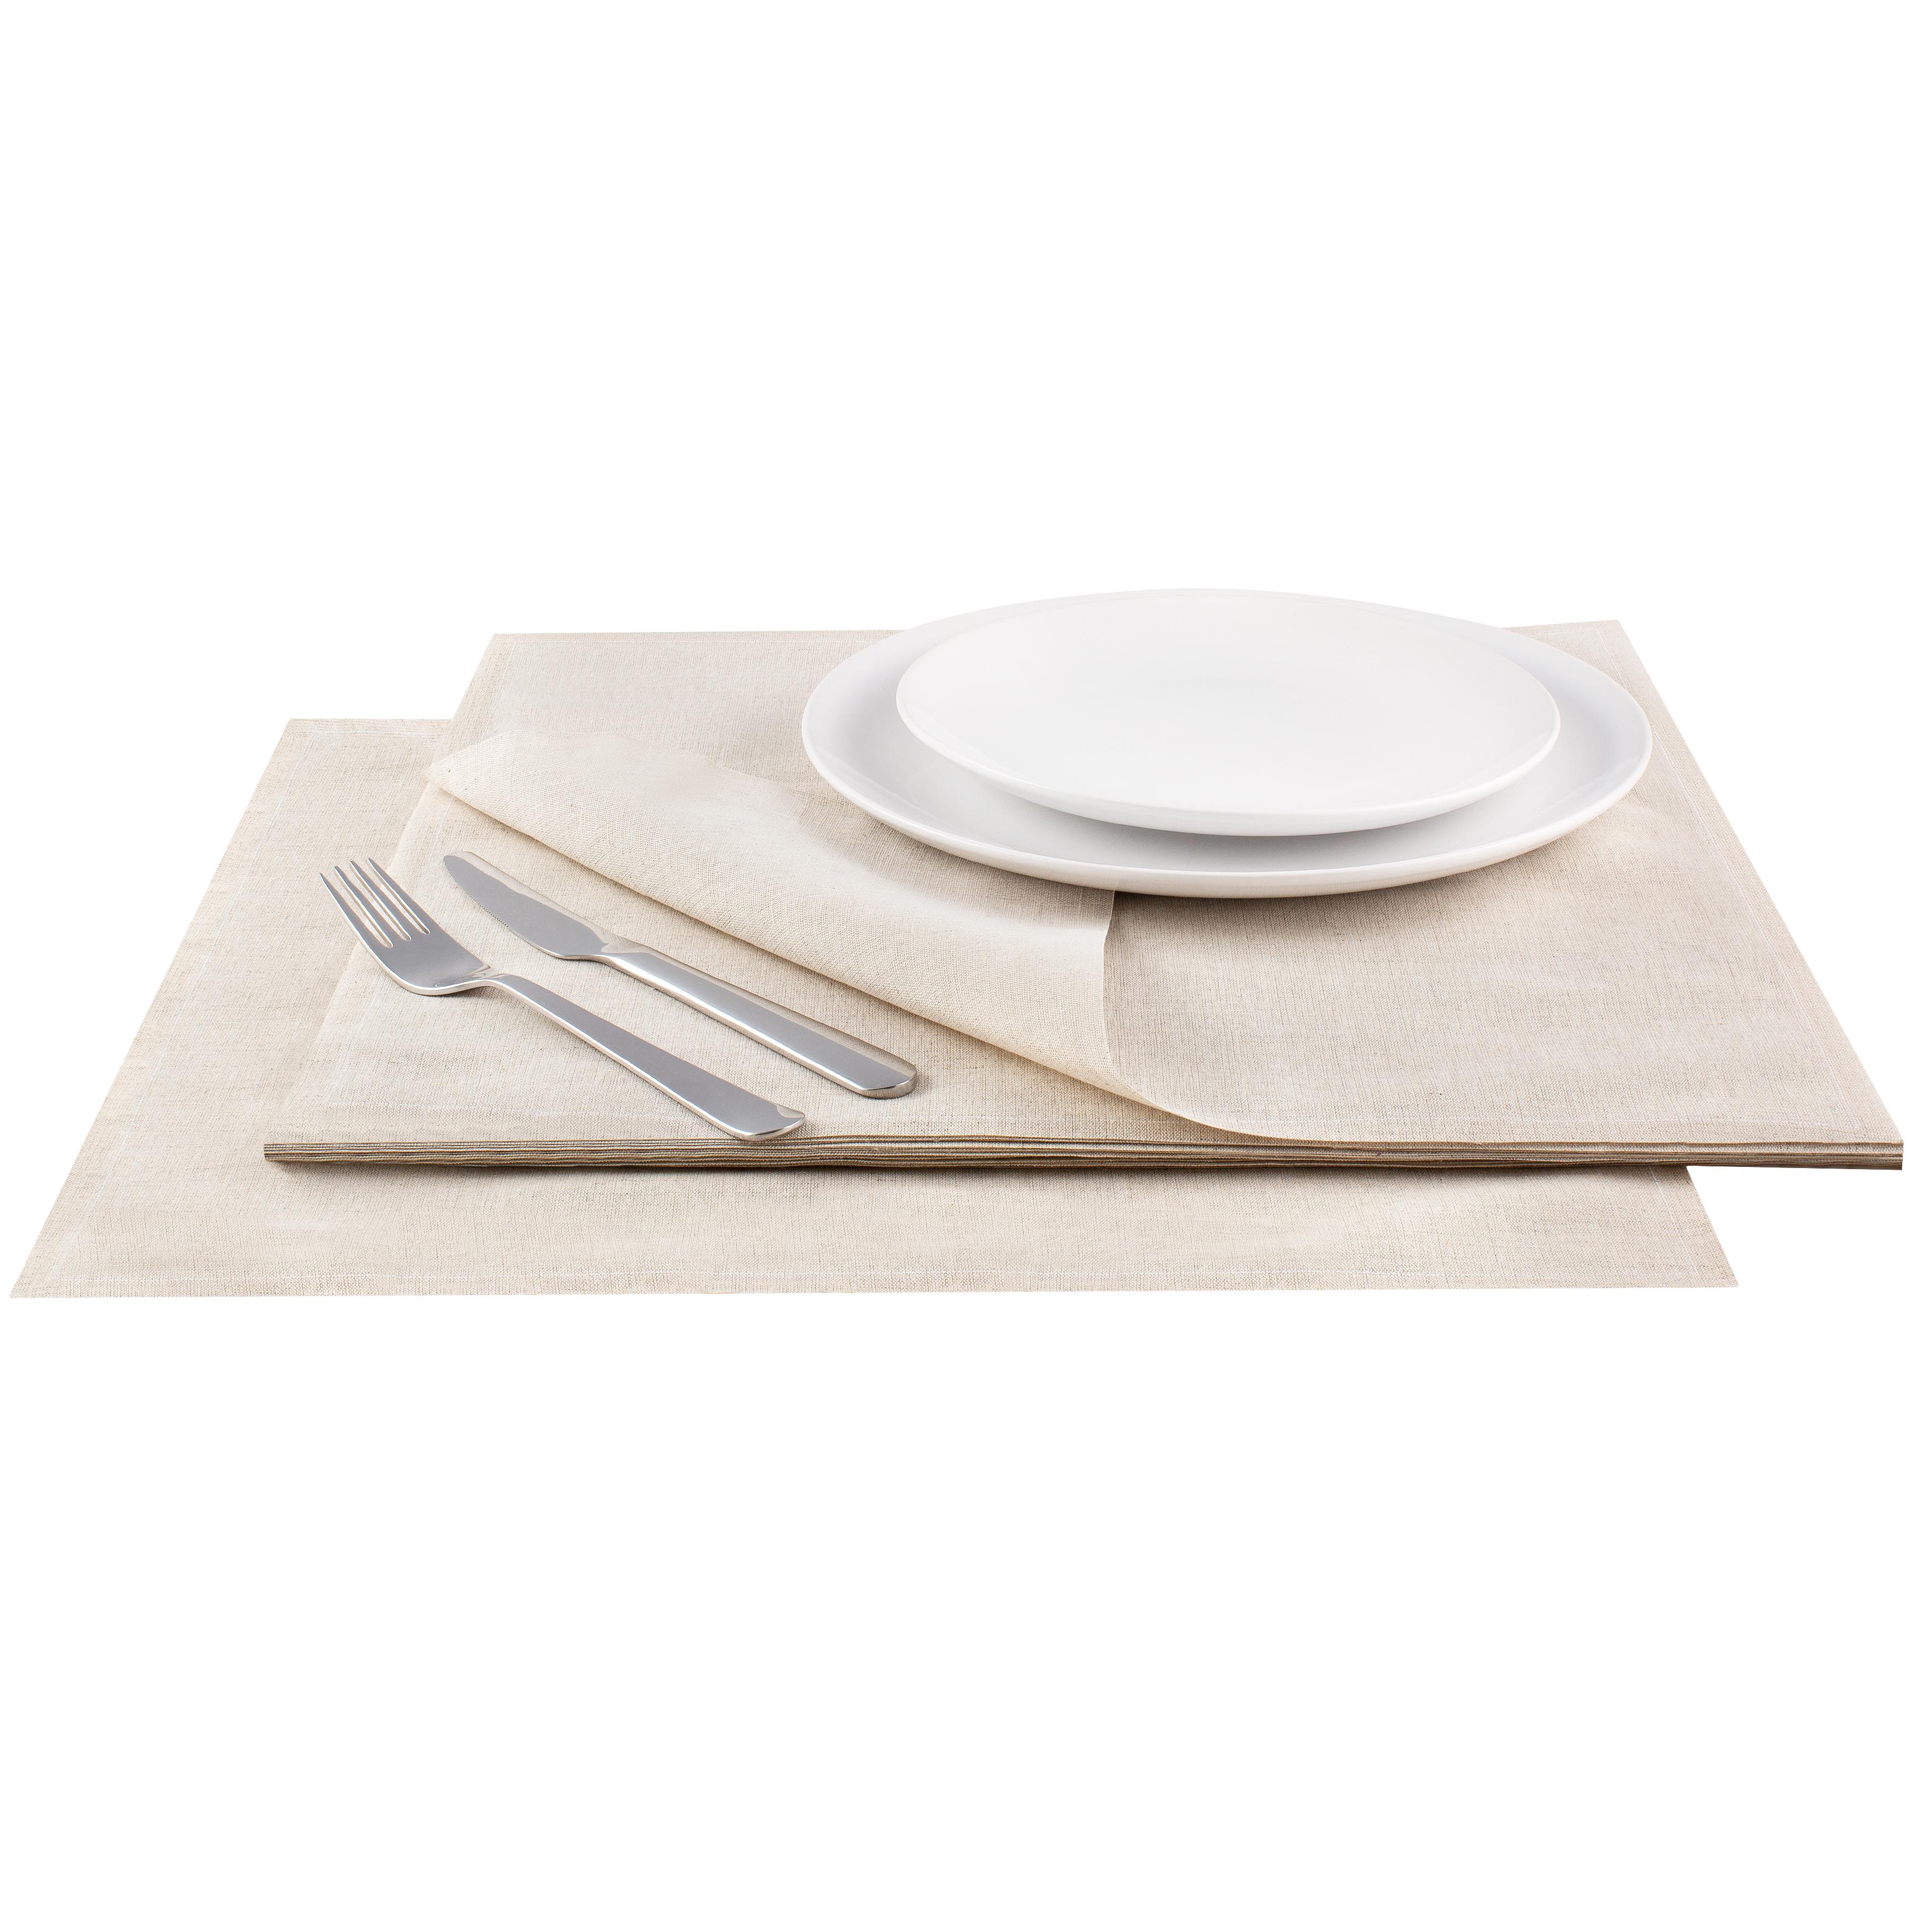 "Natural Linen Premium Dinner - 15.8"" x 15.8"" - 25 Units"